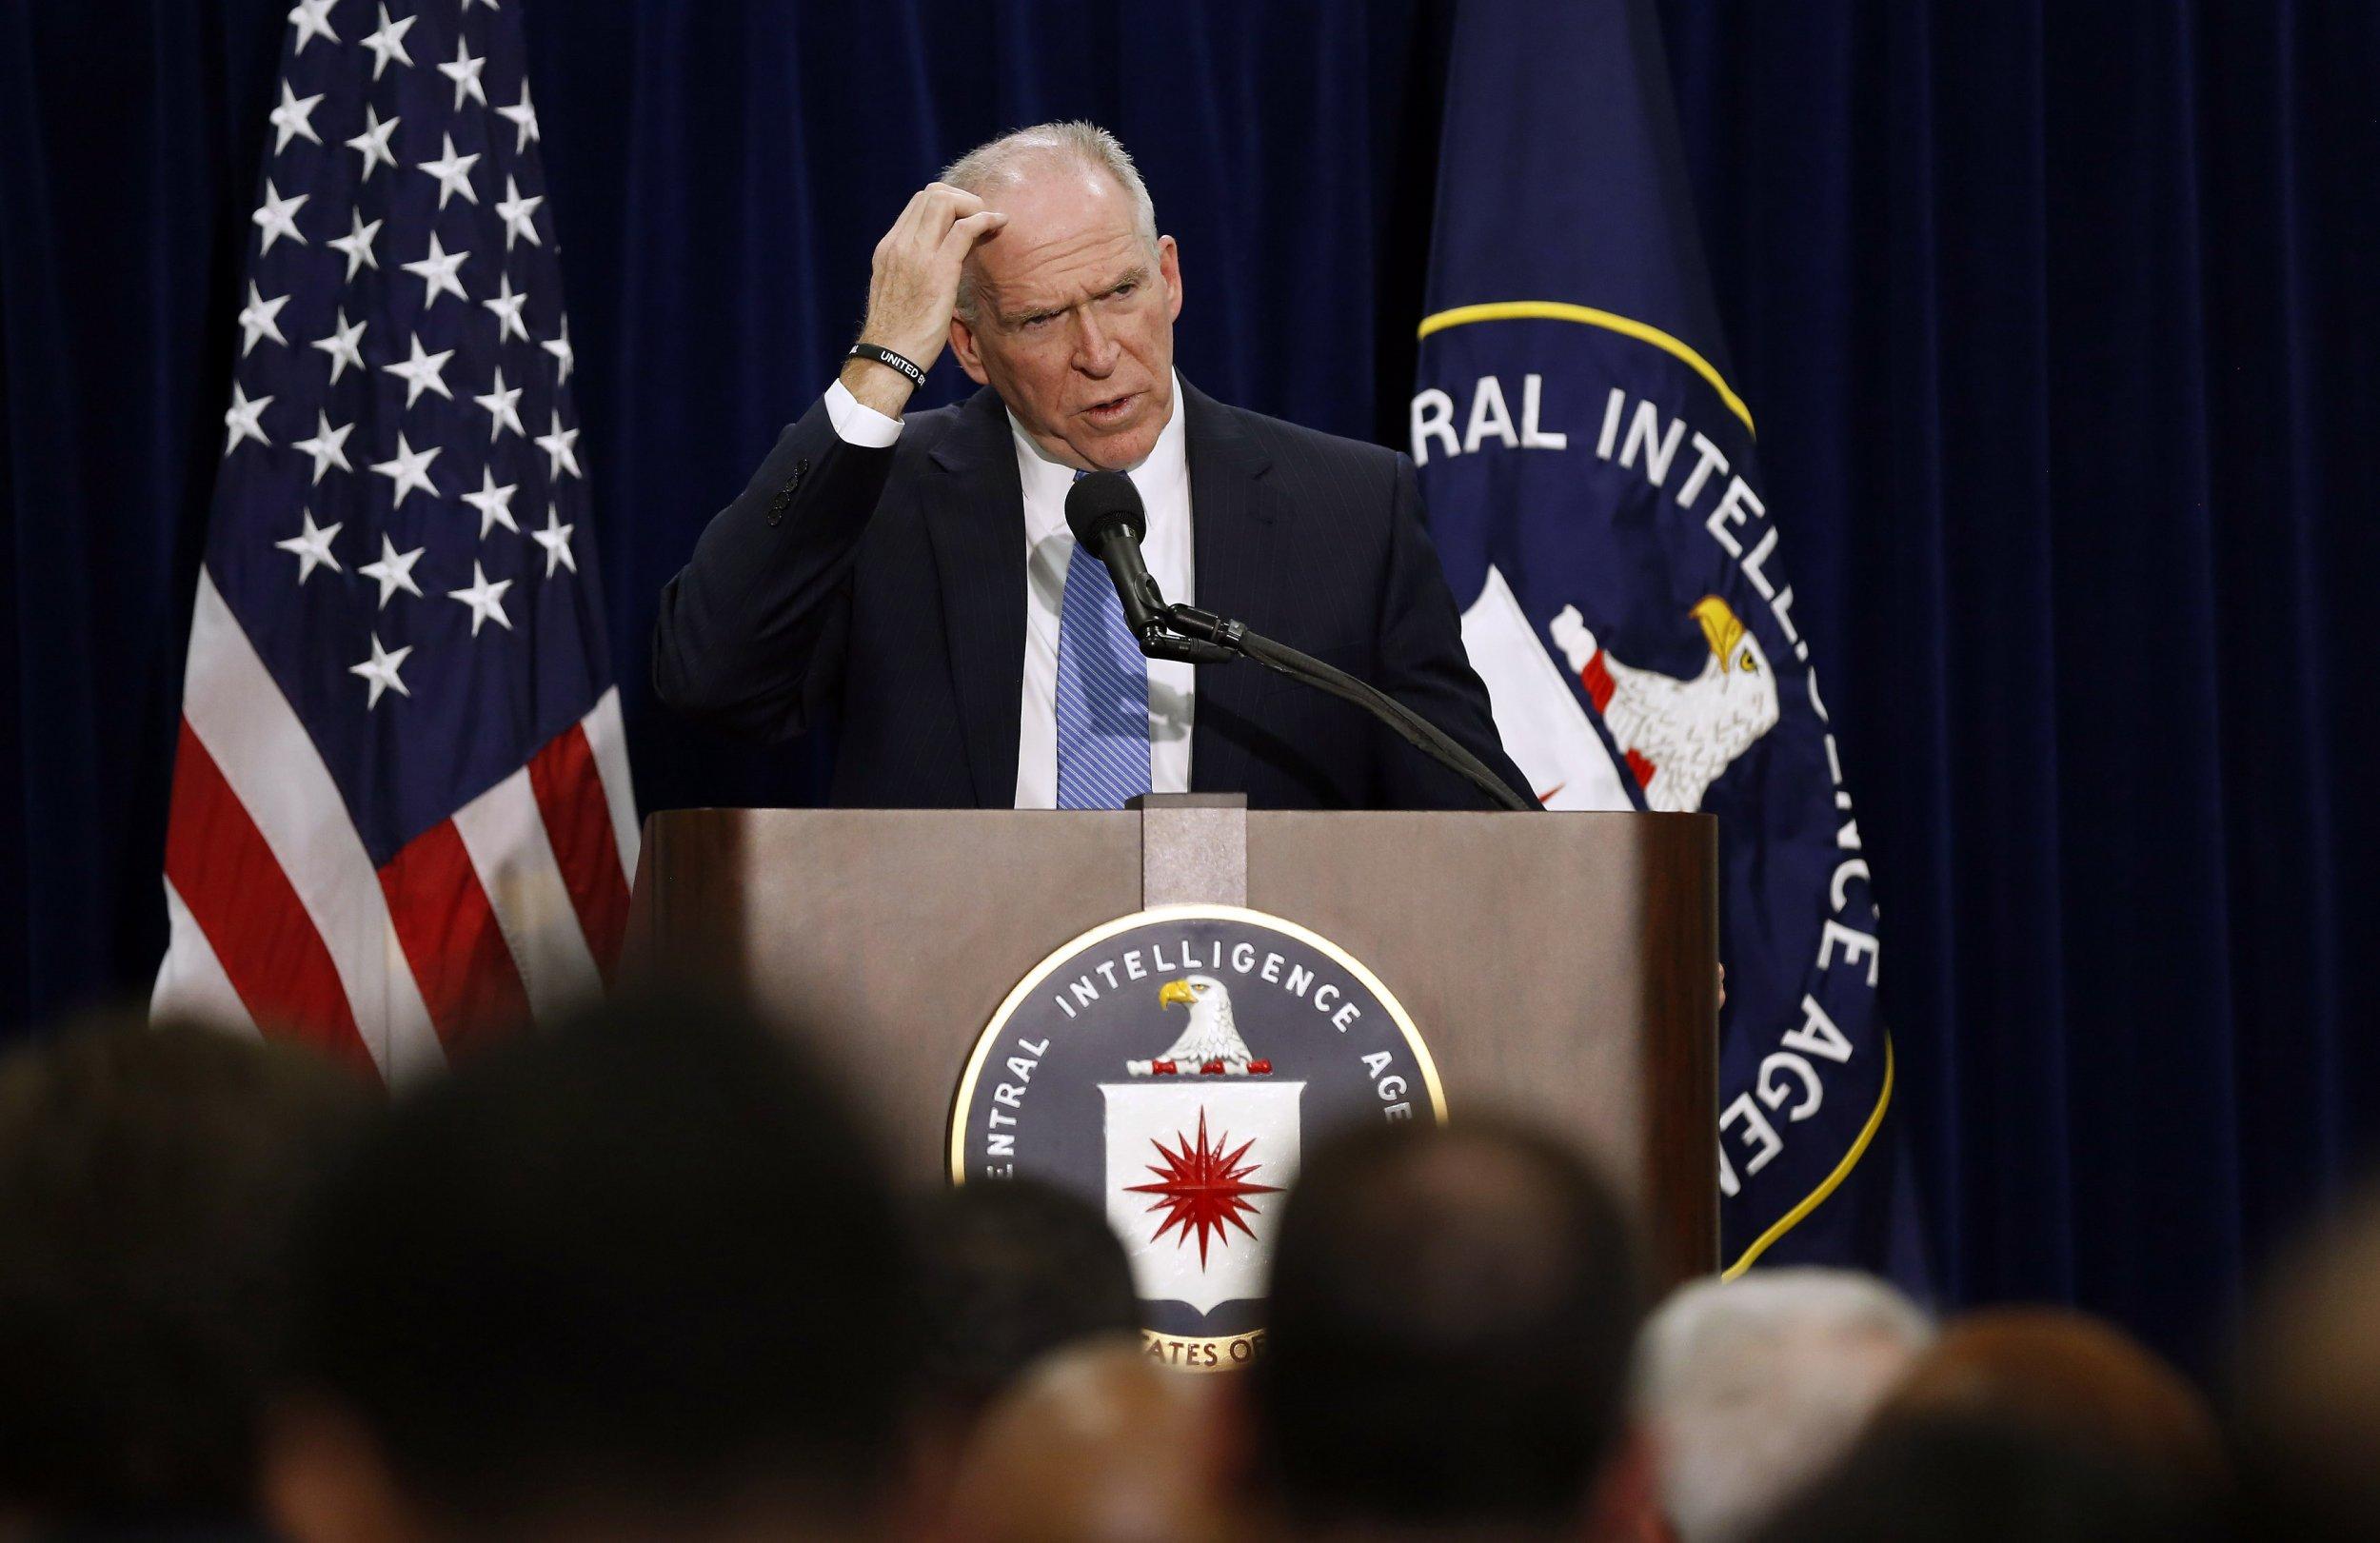 CIA hacker Cracka CWA John Brennan